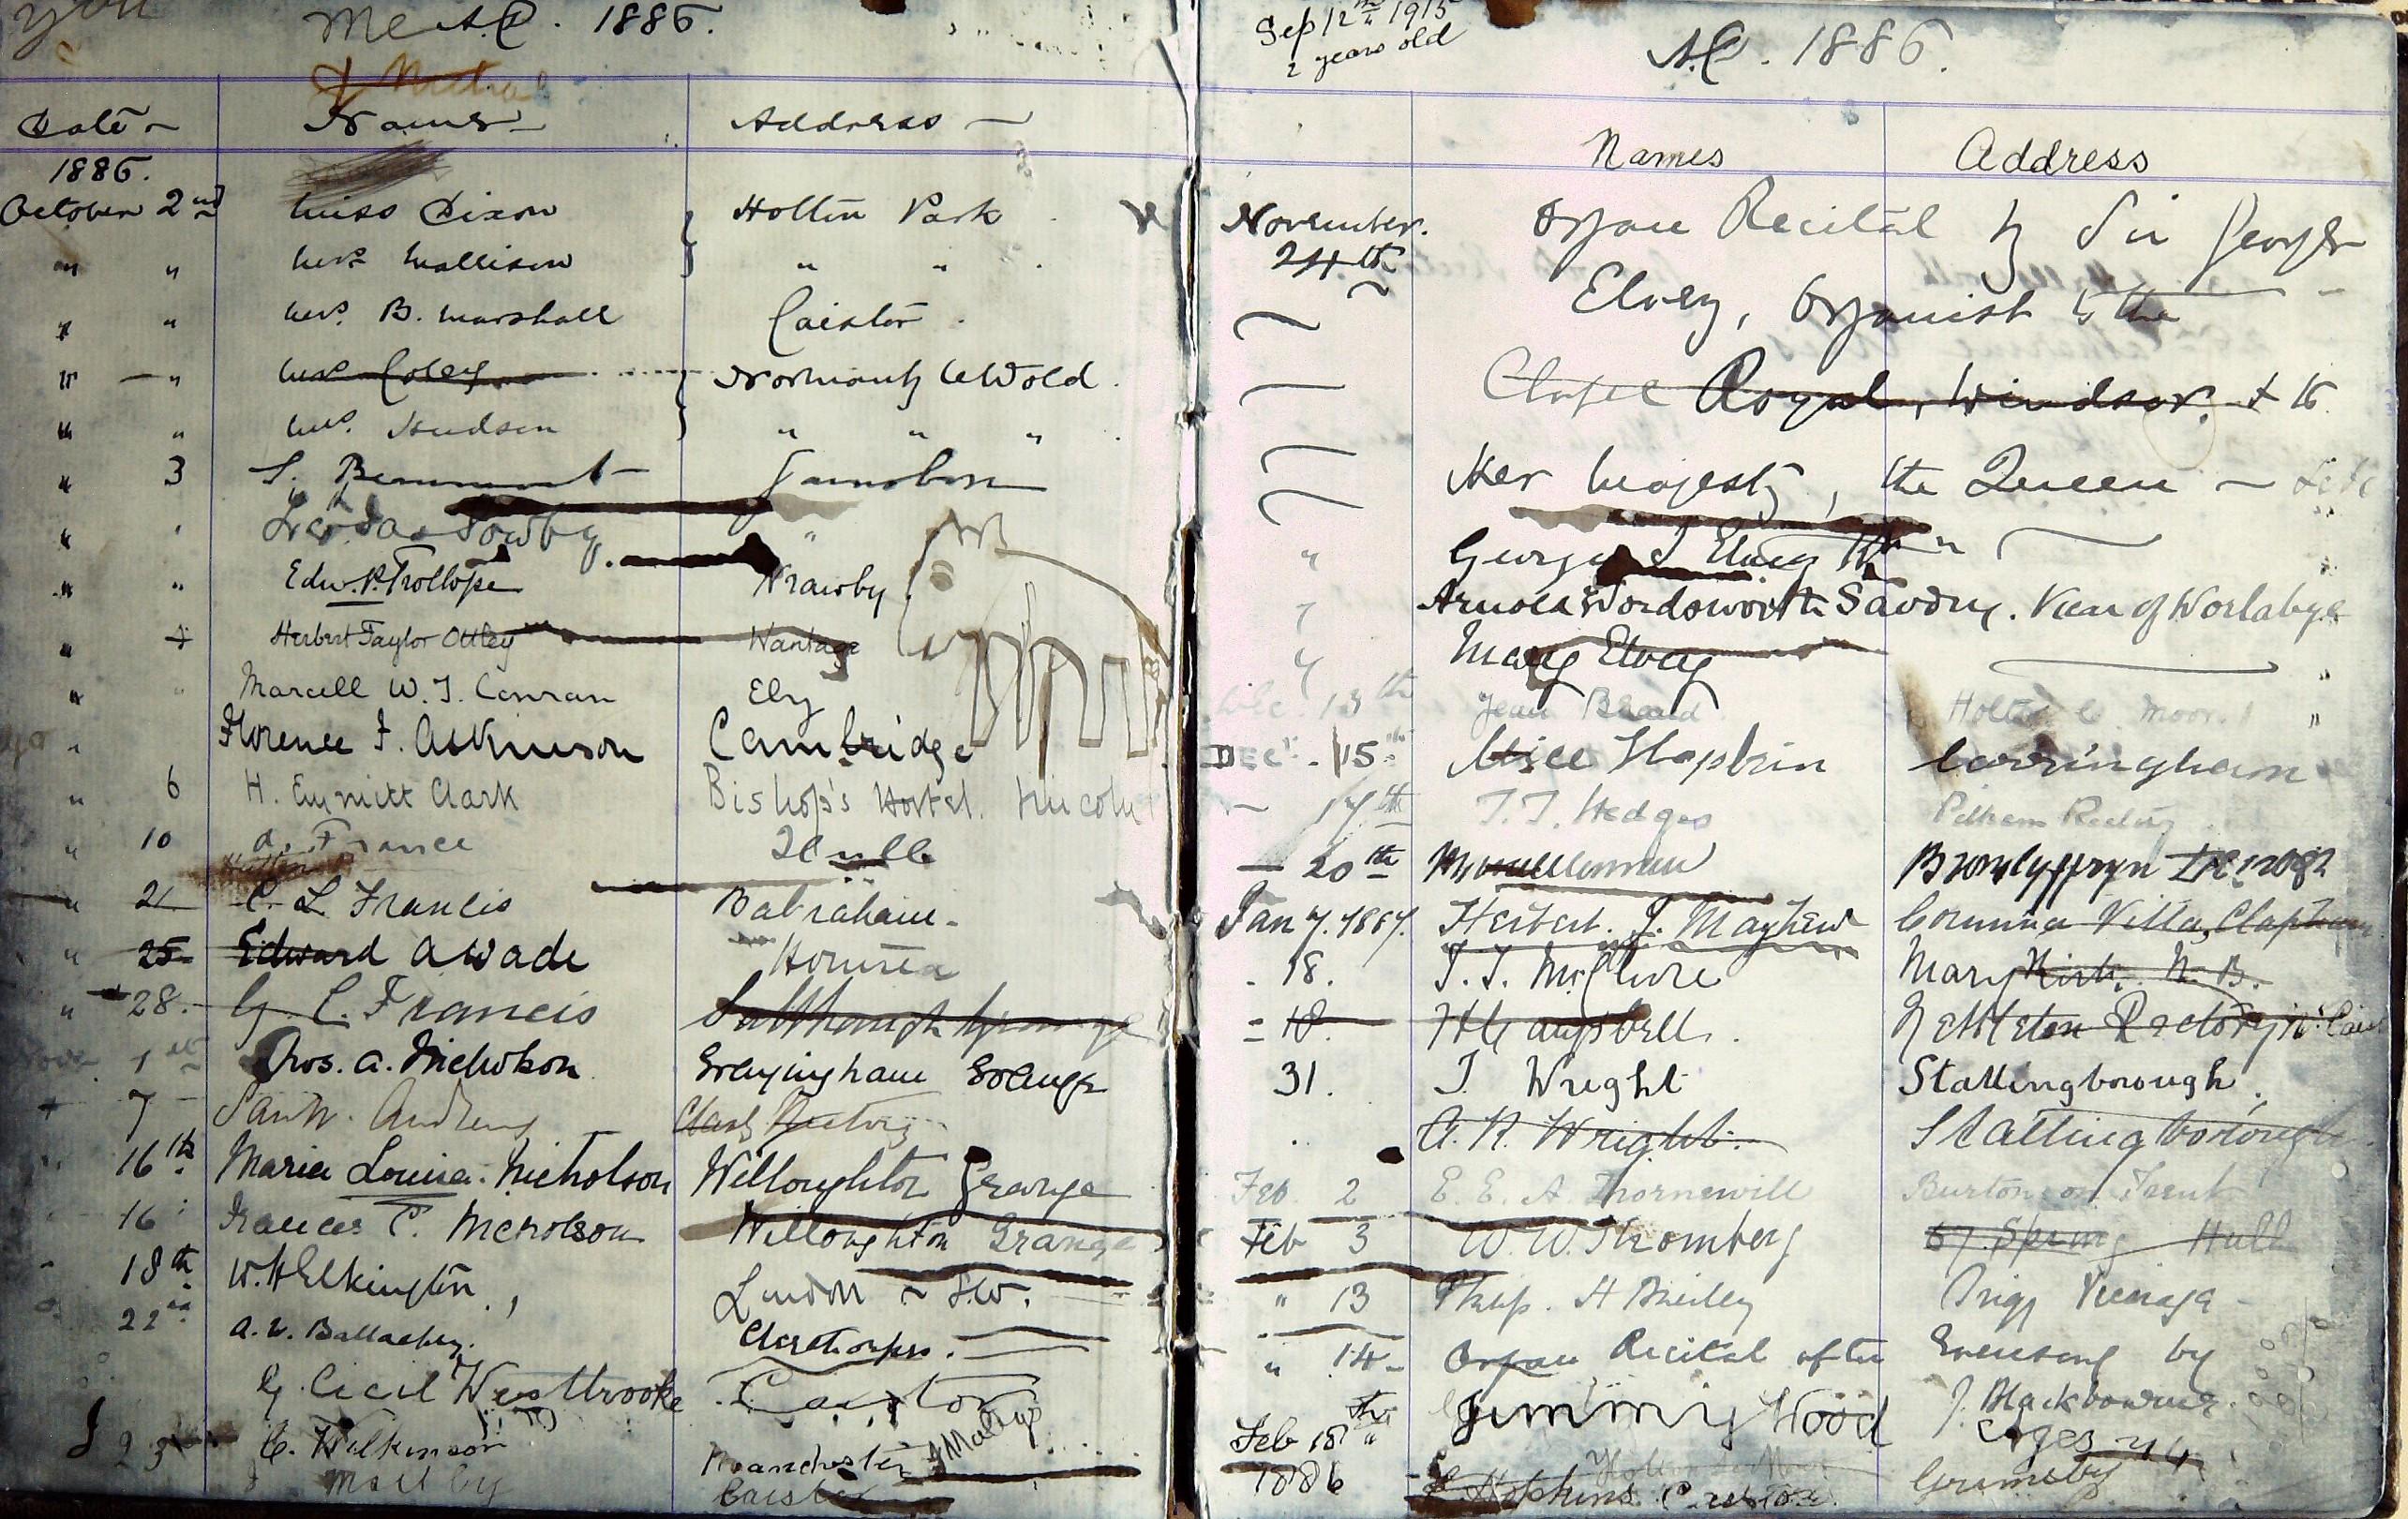 1886 10 to 1887 02.jpg